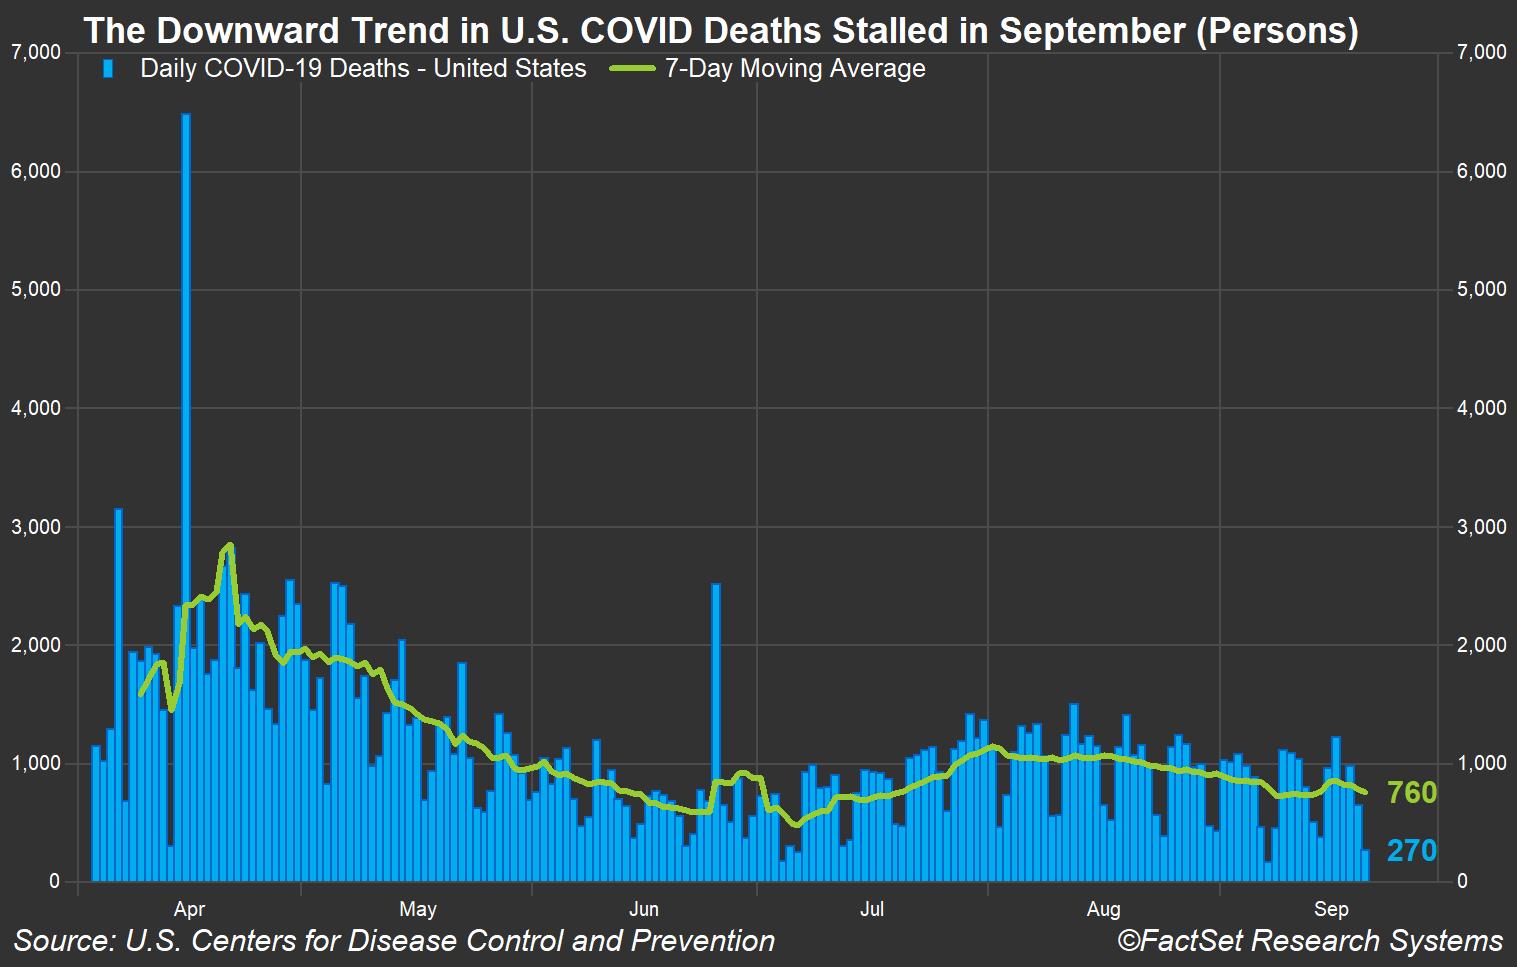 US COVID deaths